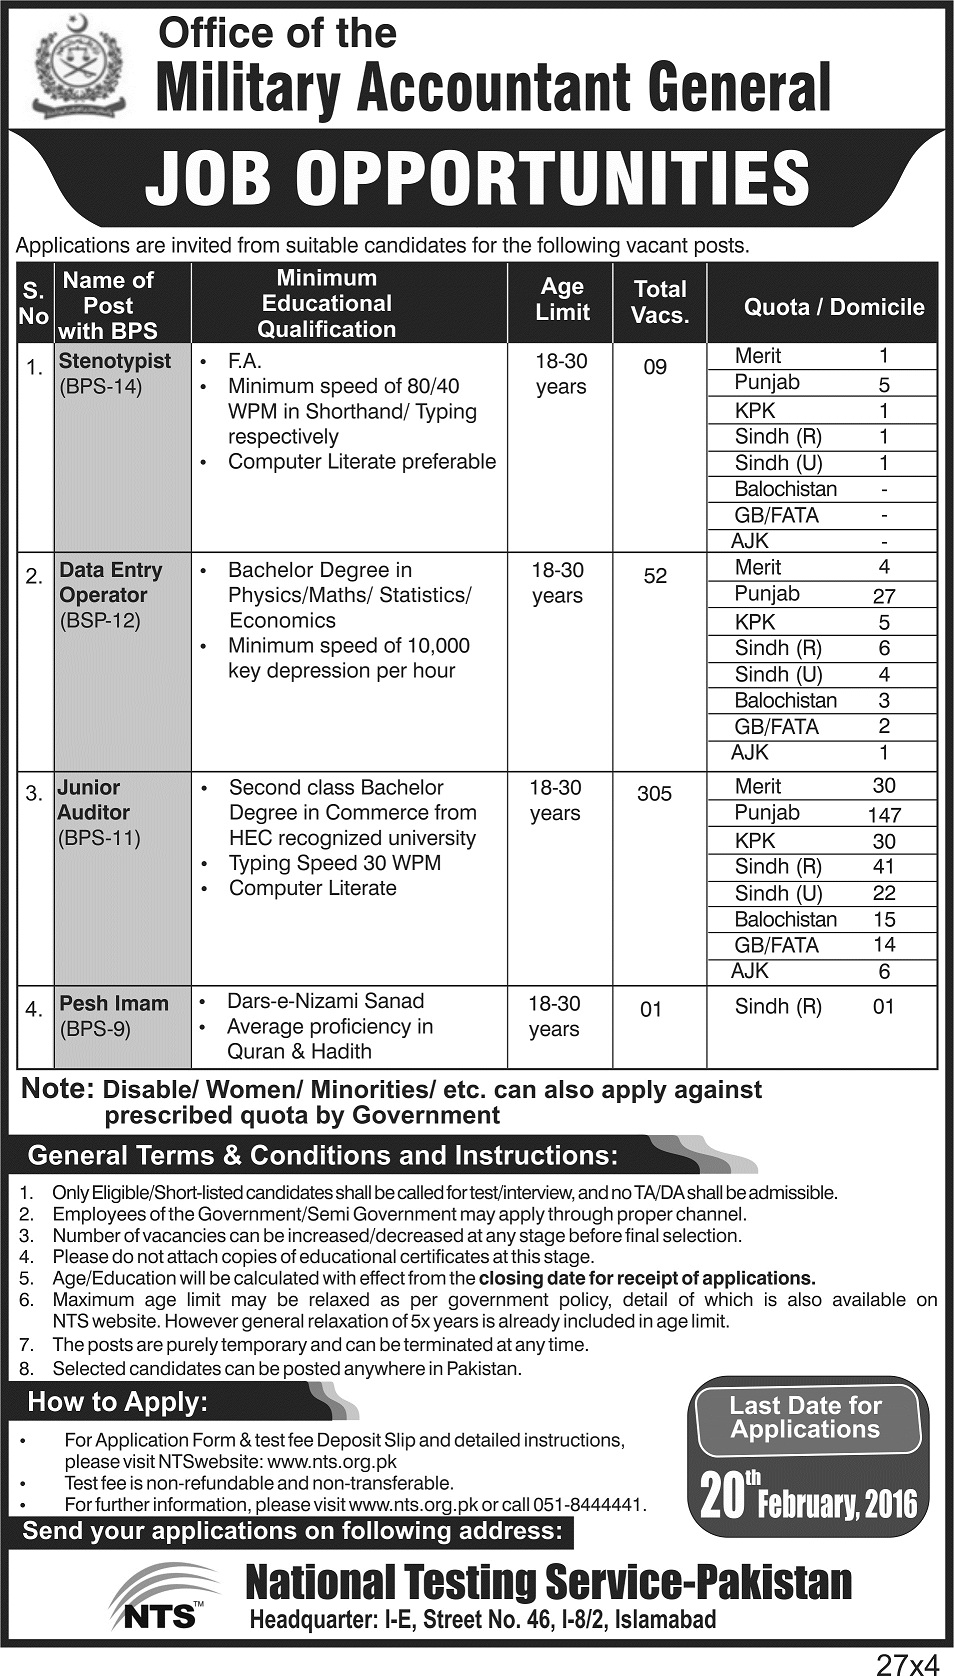 PMDA Pakistan Military Accountant General Jobs 2016 NTS Application Form Last Date